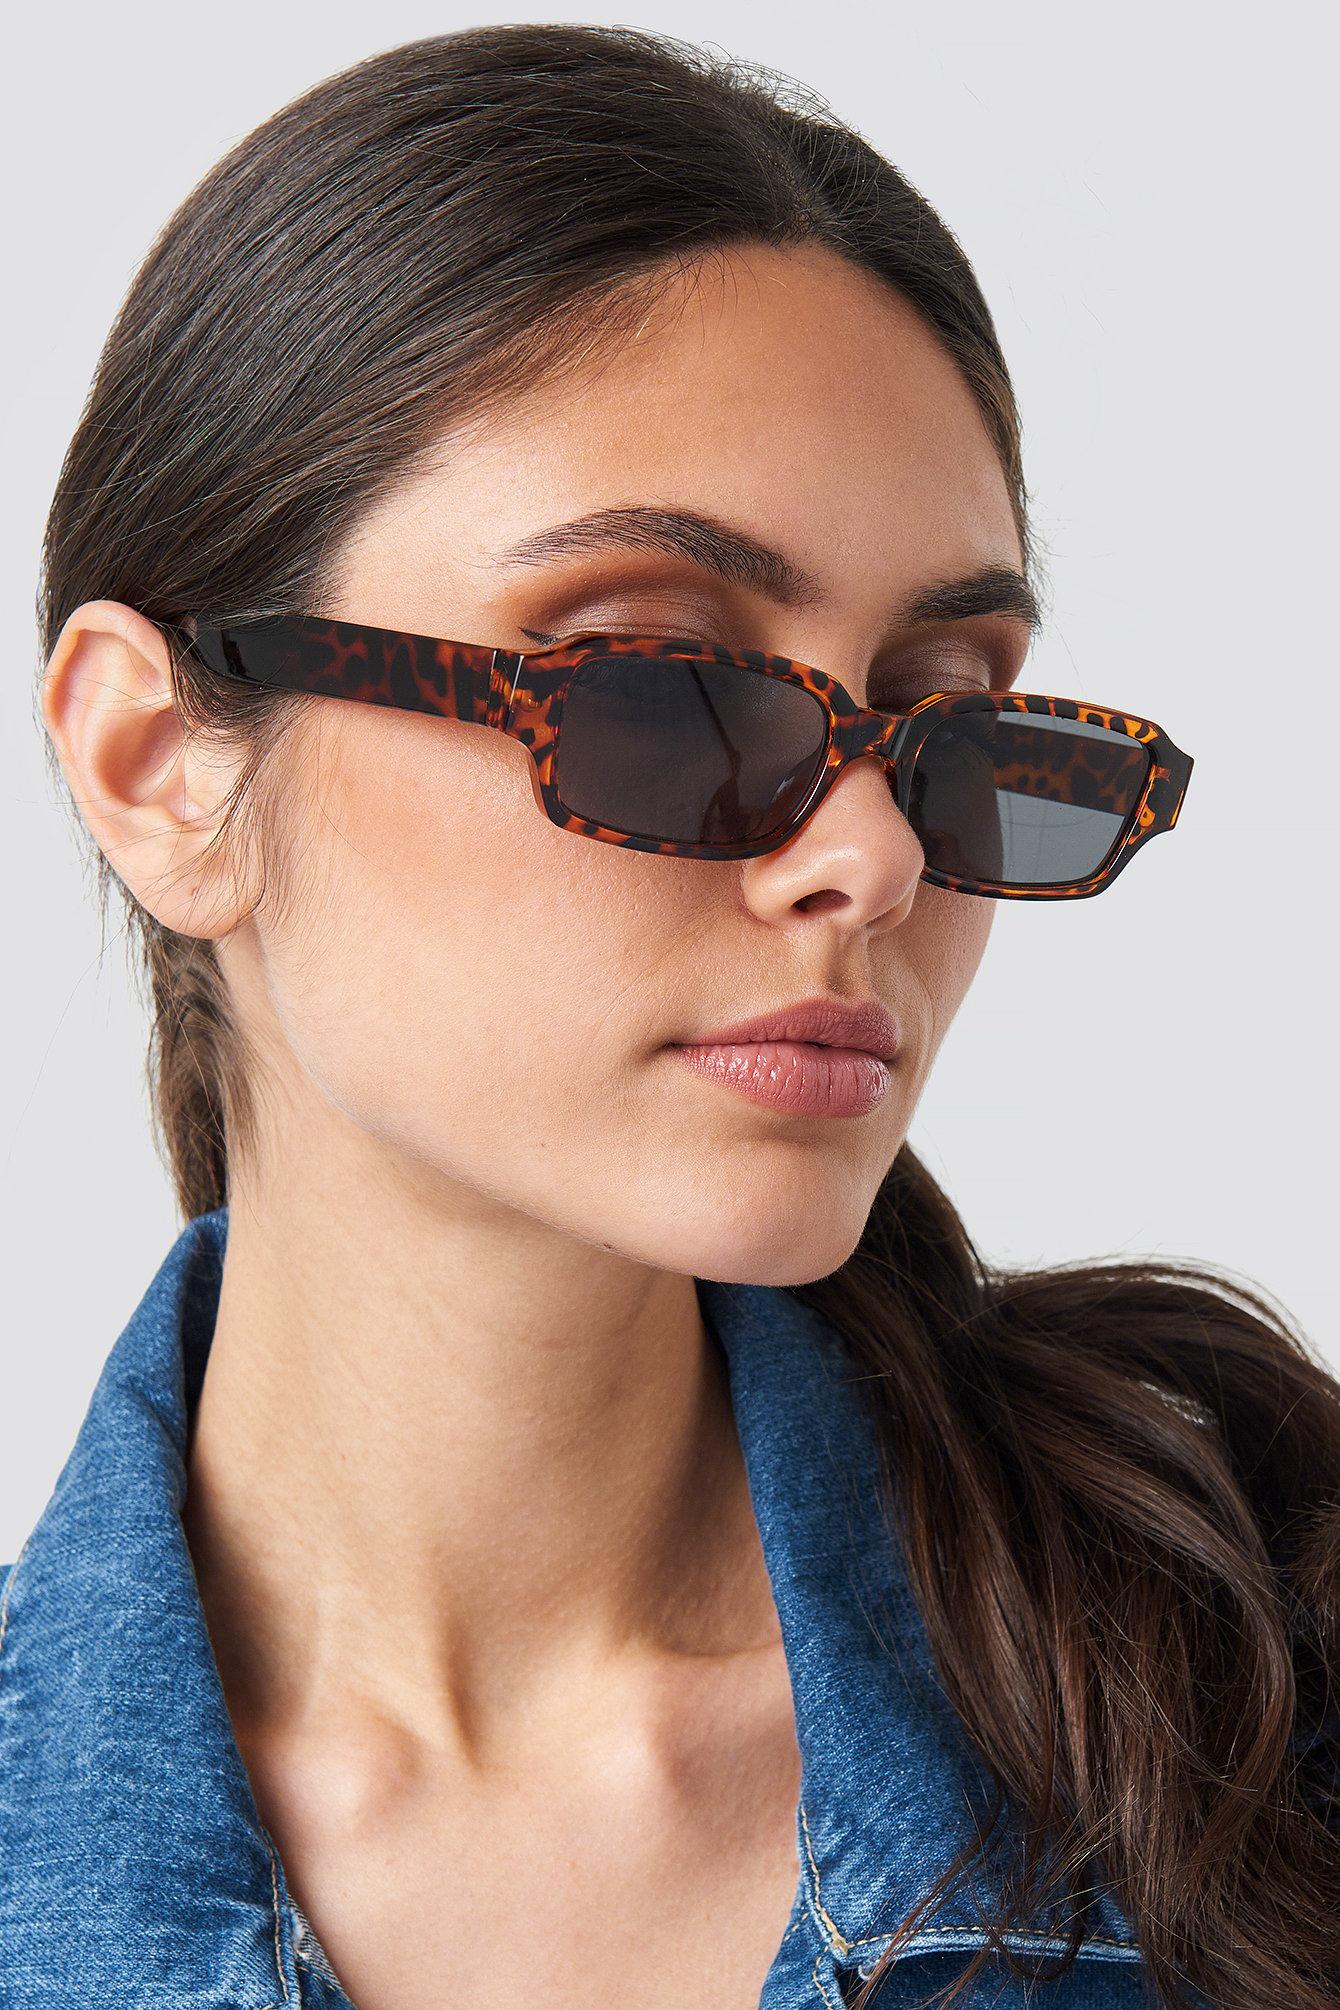 na-kd accessories -  Wide Rectangular Sunglasses - Brown